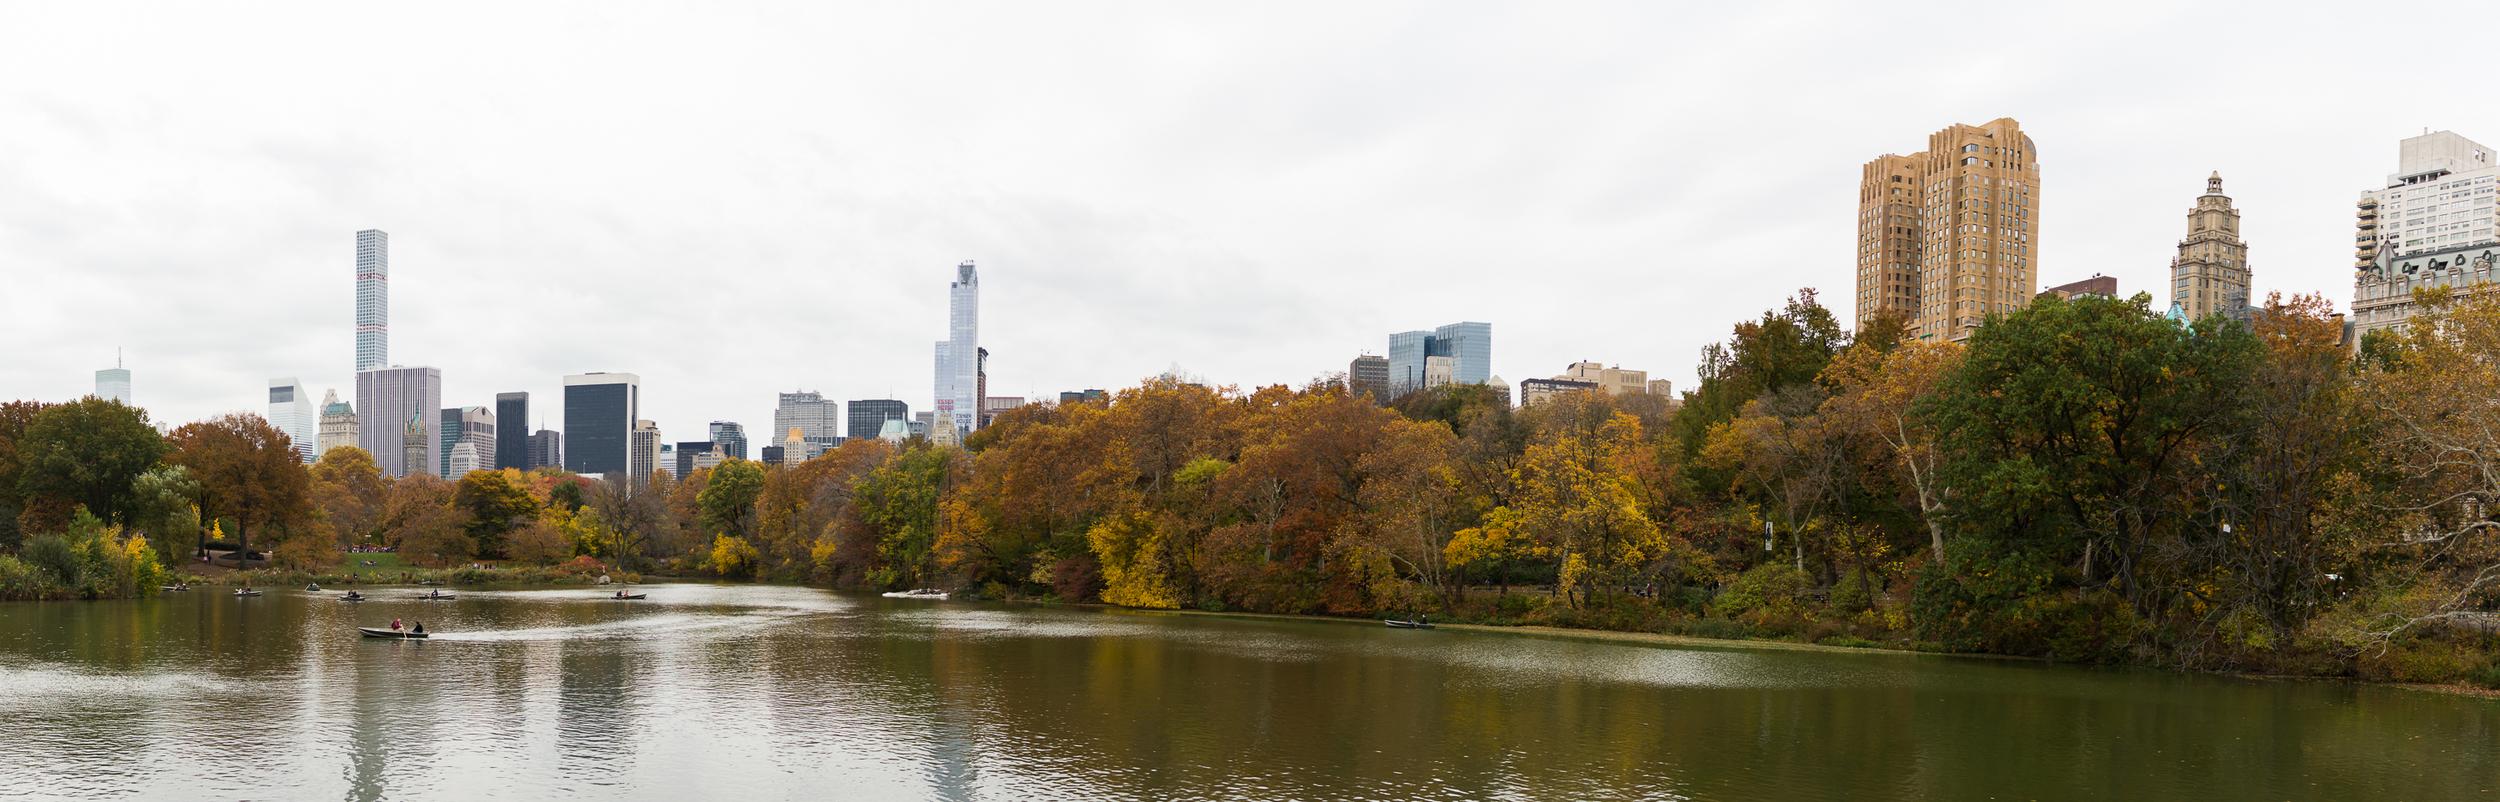 NYC_2015_013.jpg